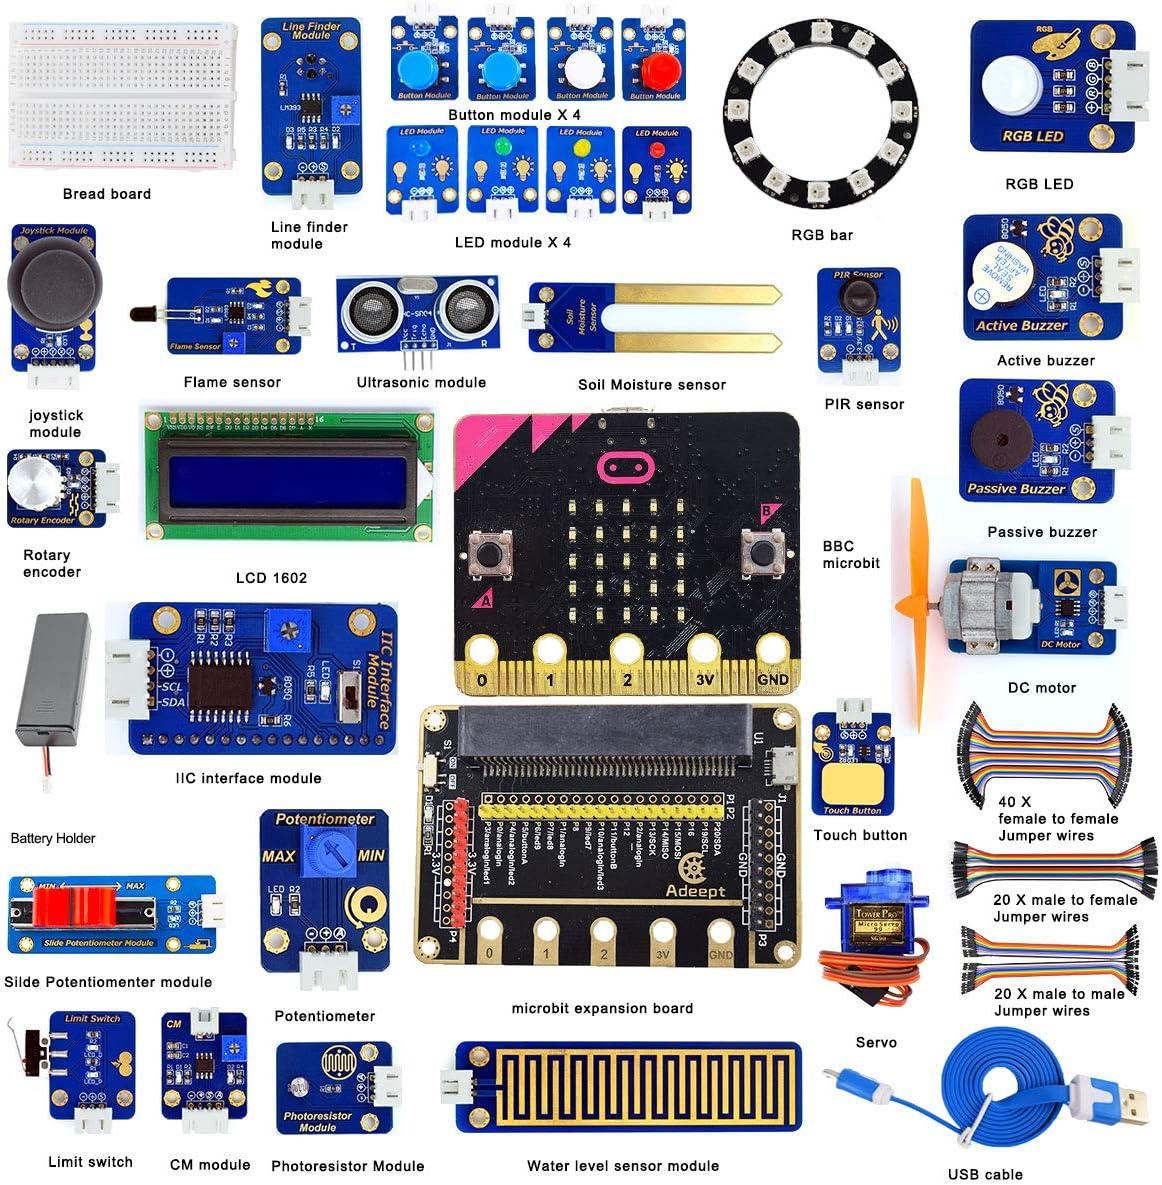 Adeept Bbc Micro:Bit Sensor Starter Kit | Microbit Programmable Starter Kit für Micro:Bit mit 35 Projects Pdf Tutorial Buch | Micro:Bit und Expansion Board Included